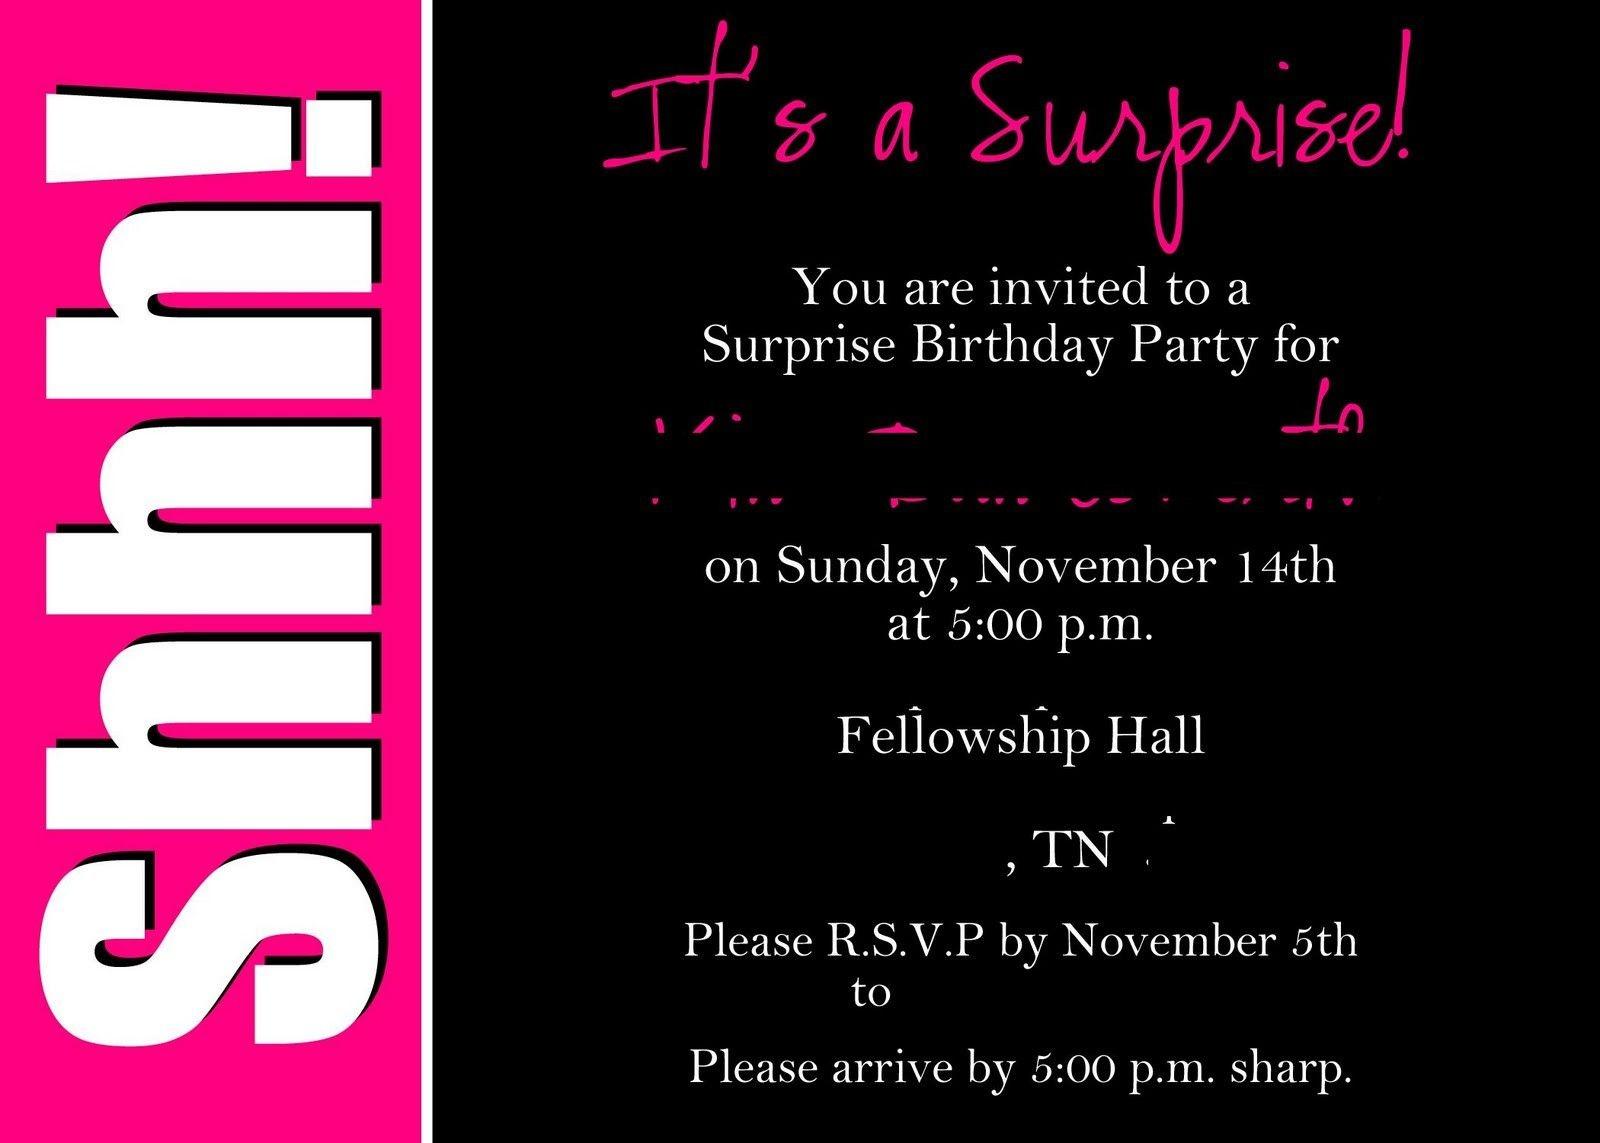 40Th Surprise Birthday Party Invitations | Free Printable Birthday - Free Printable Surprise 60Th Birthday Invitations